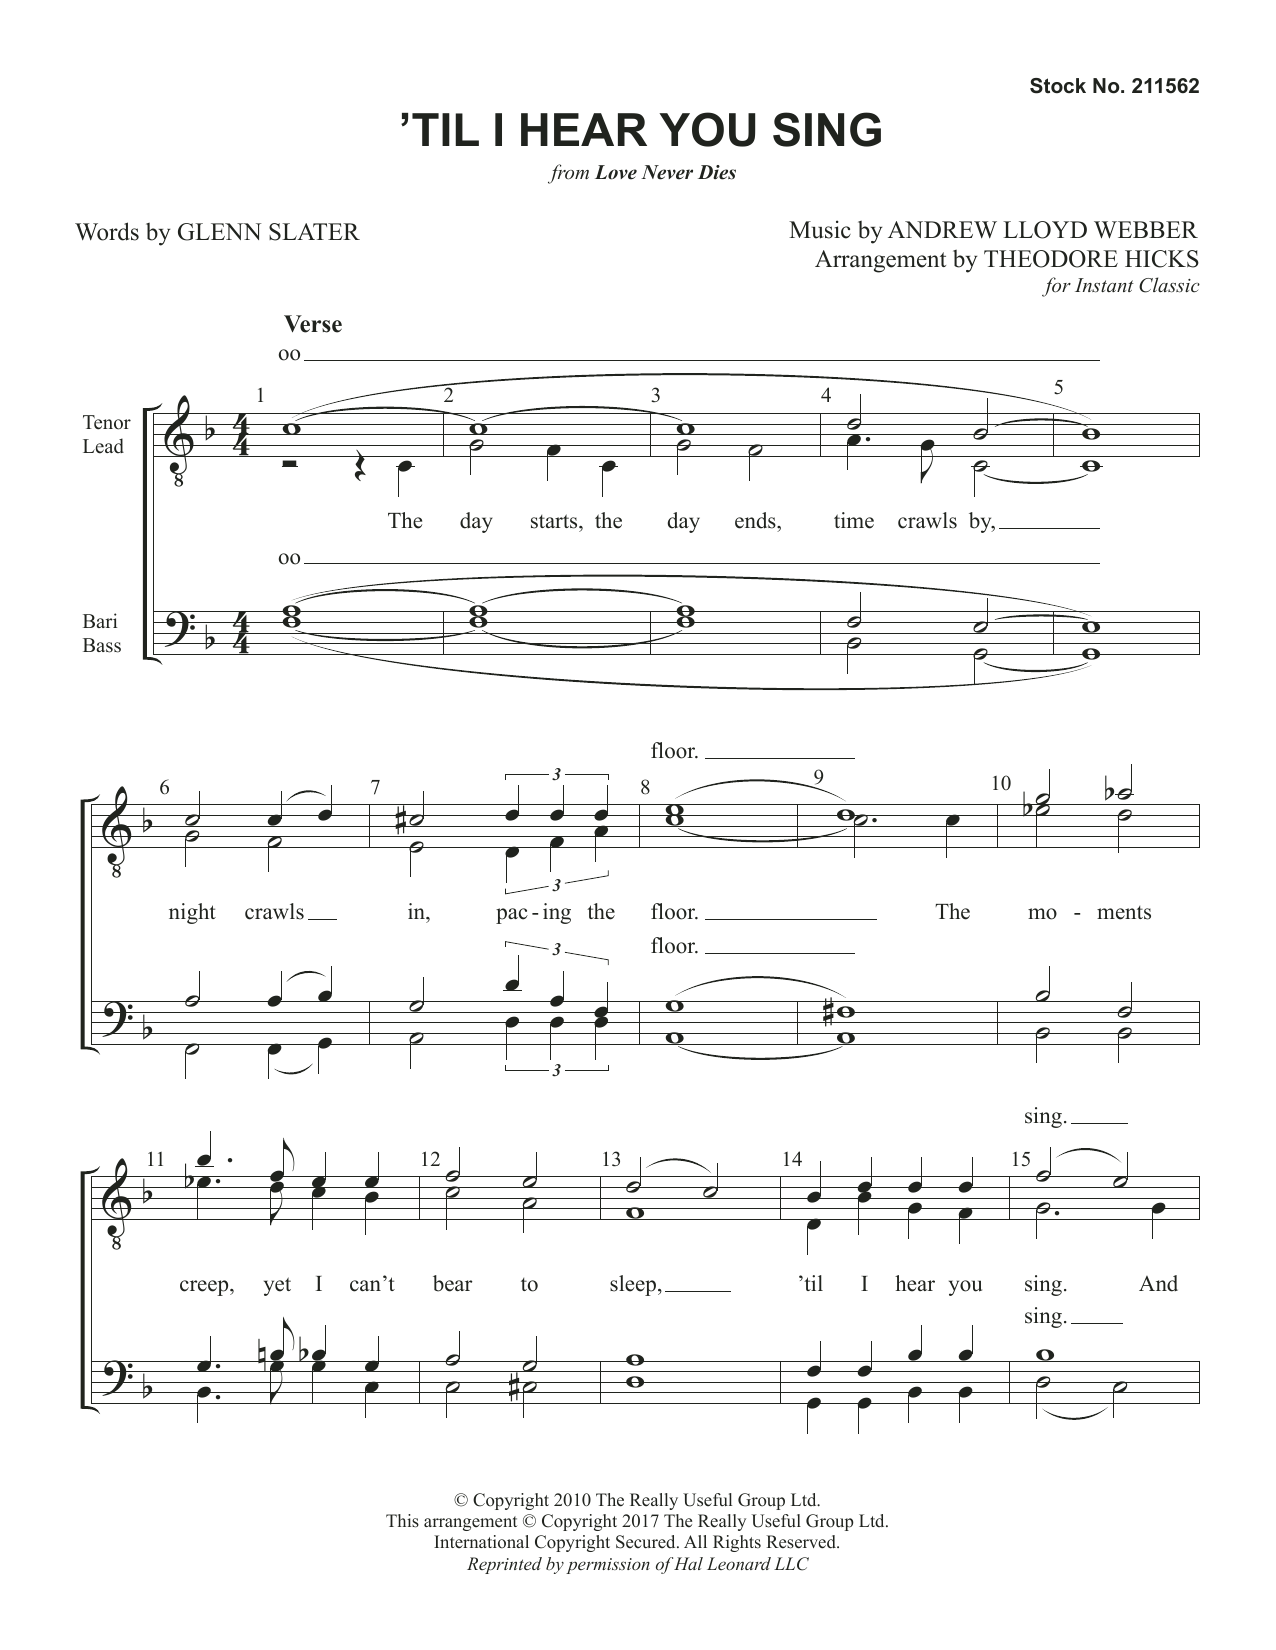 'Til I Hear You Sing (from Love Never Dies) (arr. Theodore Hicks) (TTBB Choir)